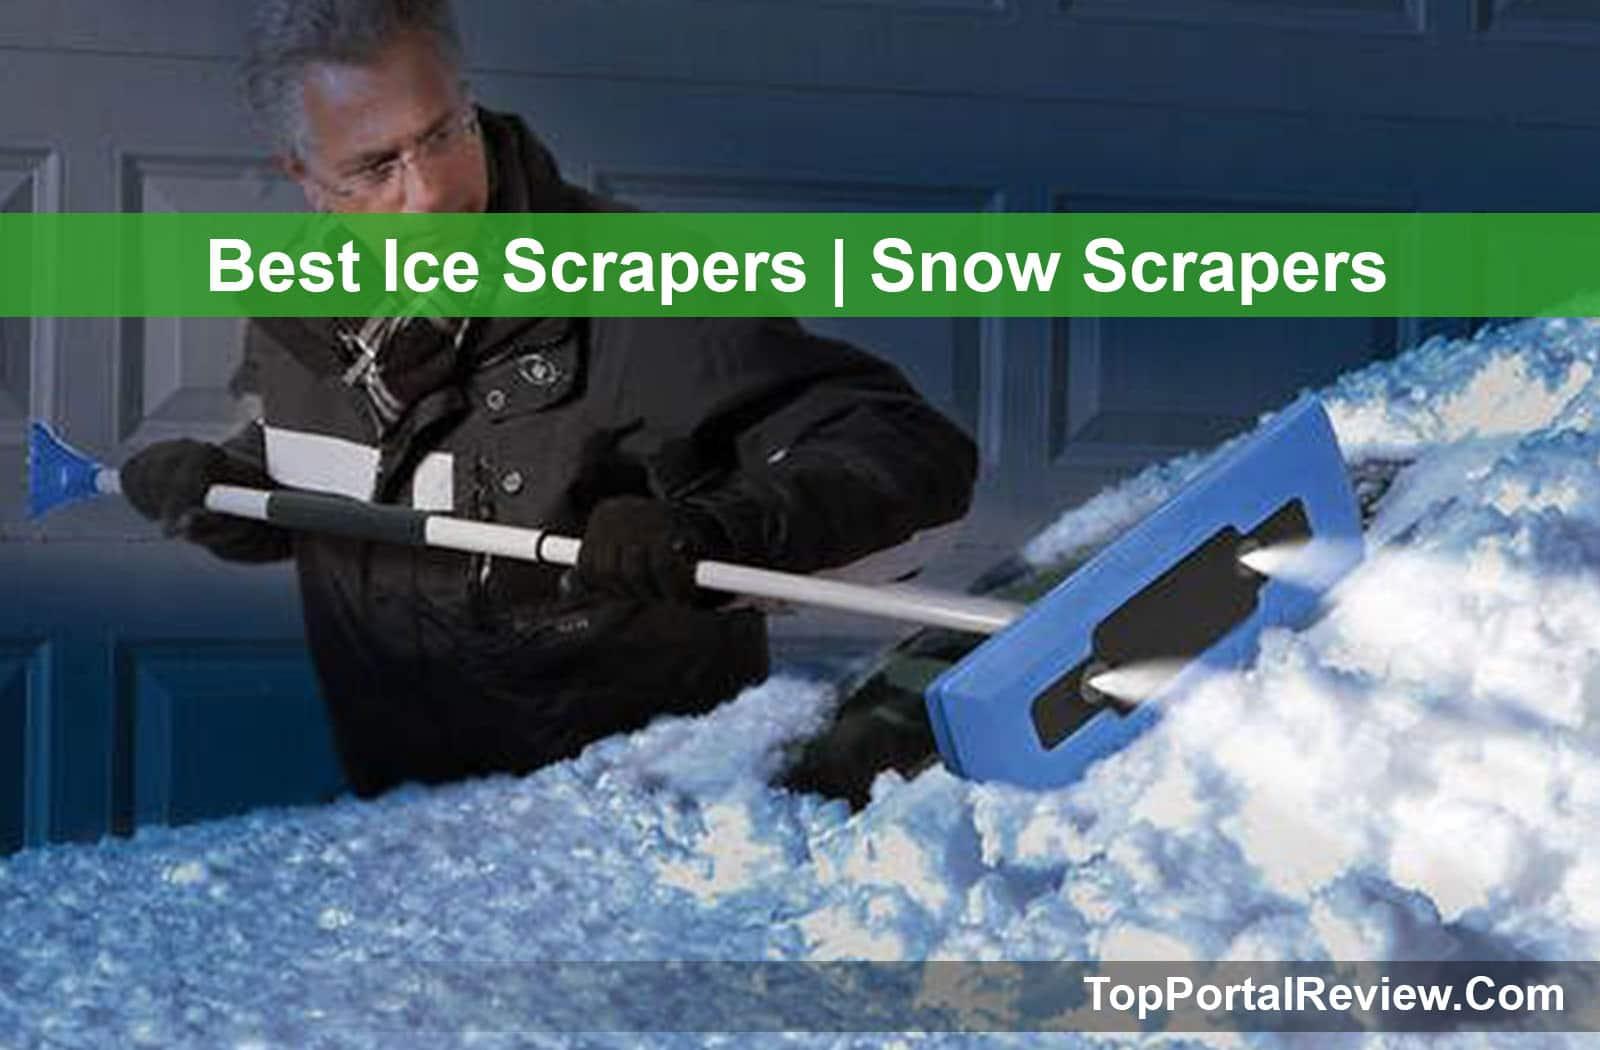 Top 10 Best Ice Scrapers Snow Scrapers 2019 Reviews